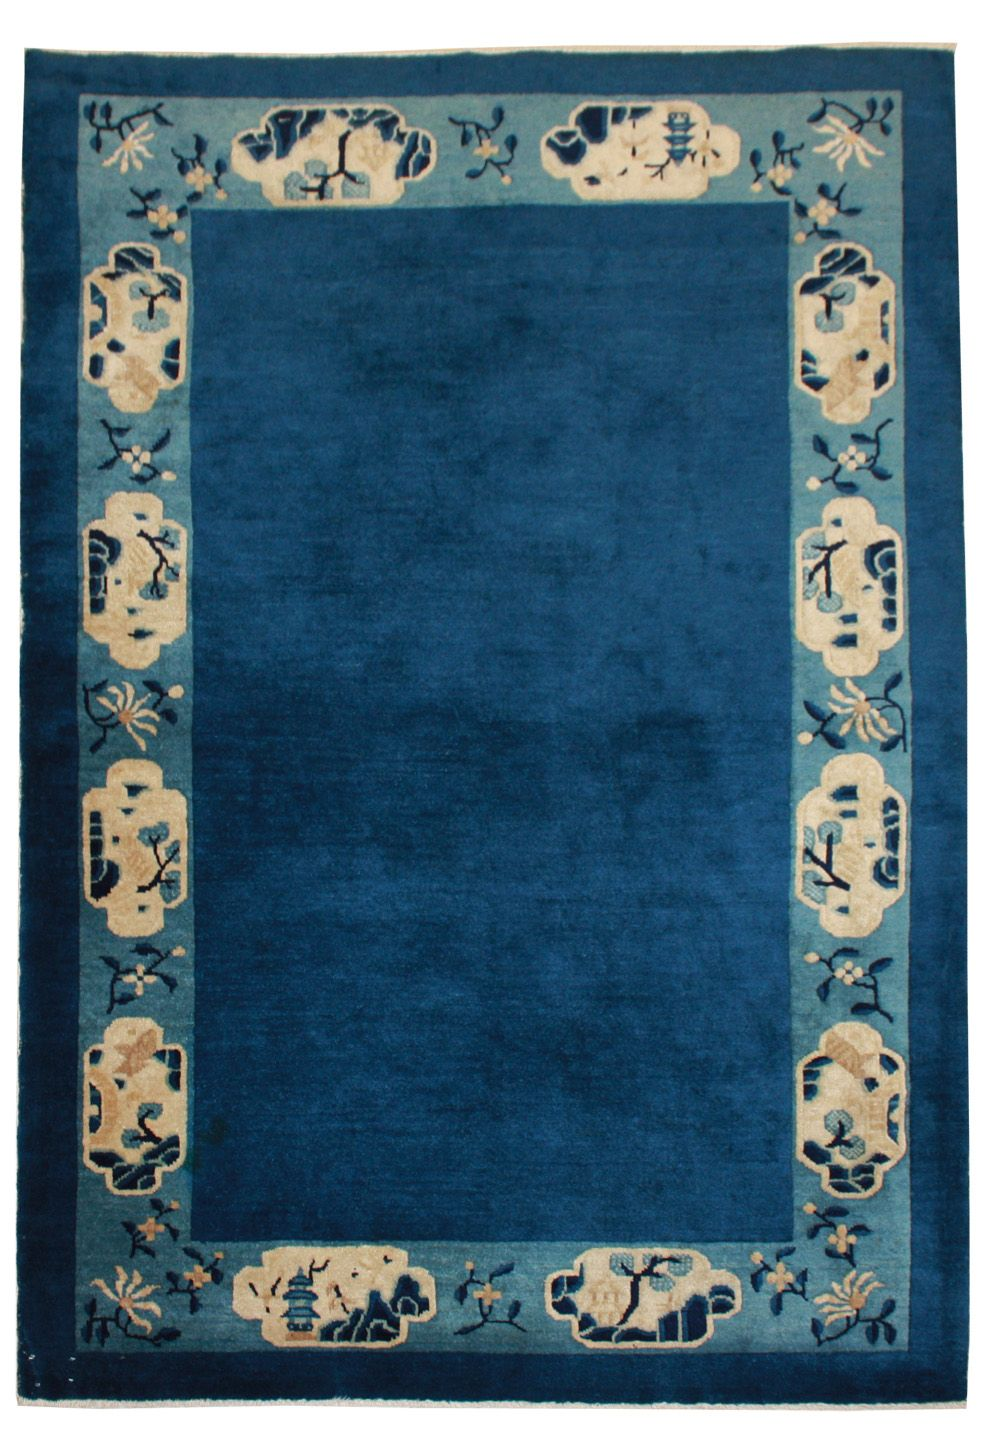 Cod. 913 Pechino antico tappeto cinese antique rug